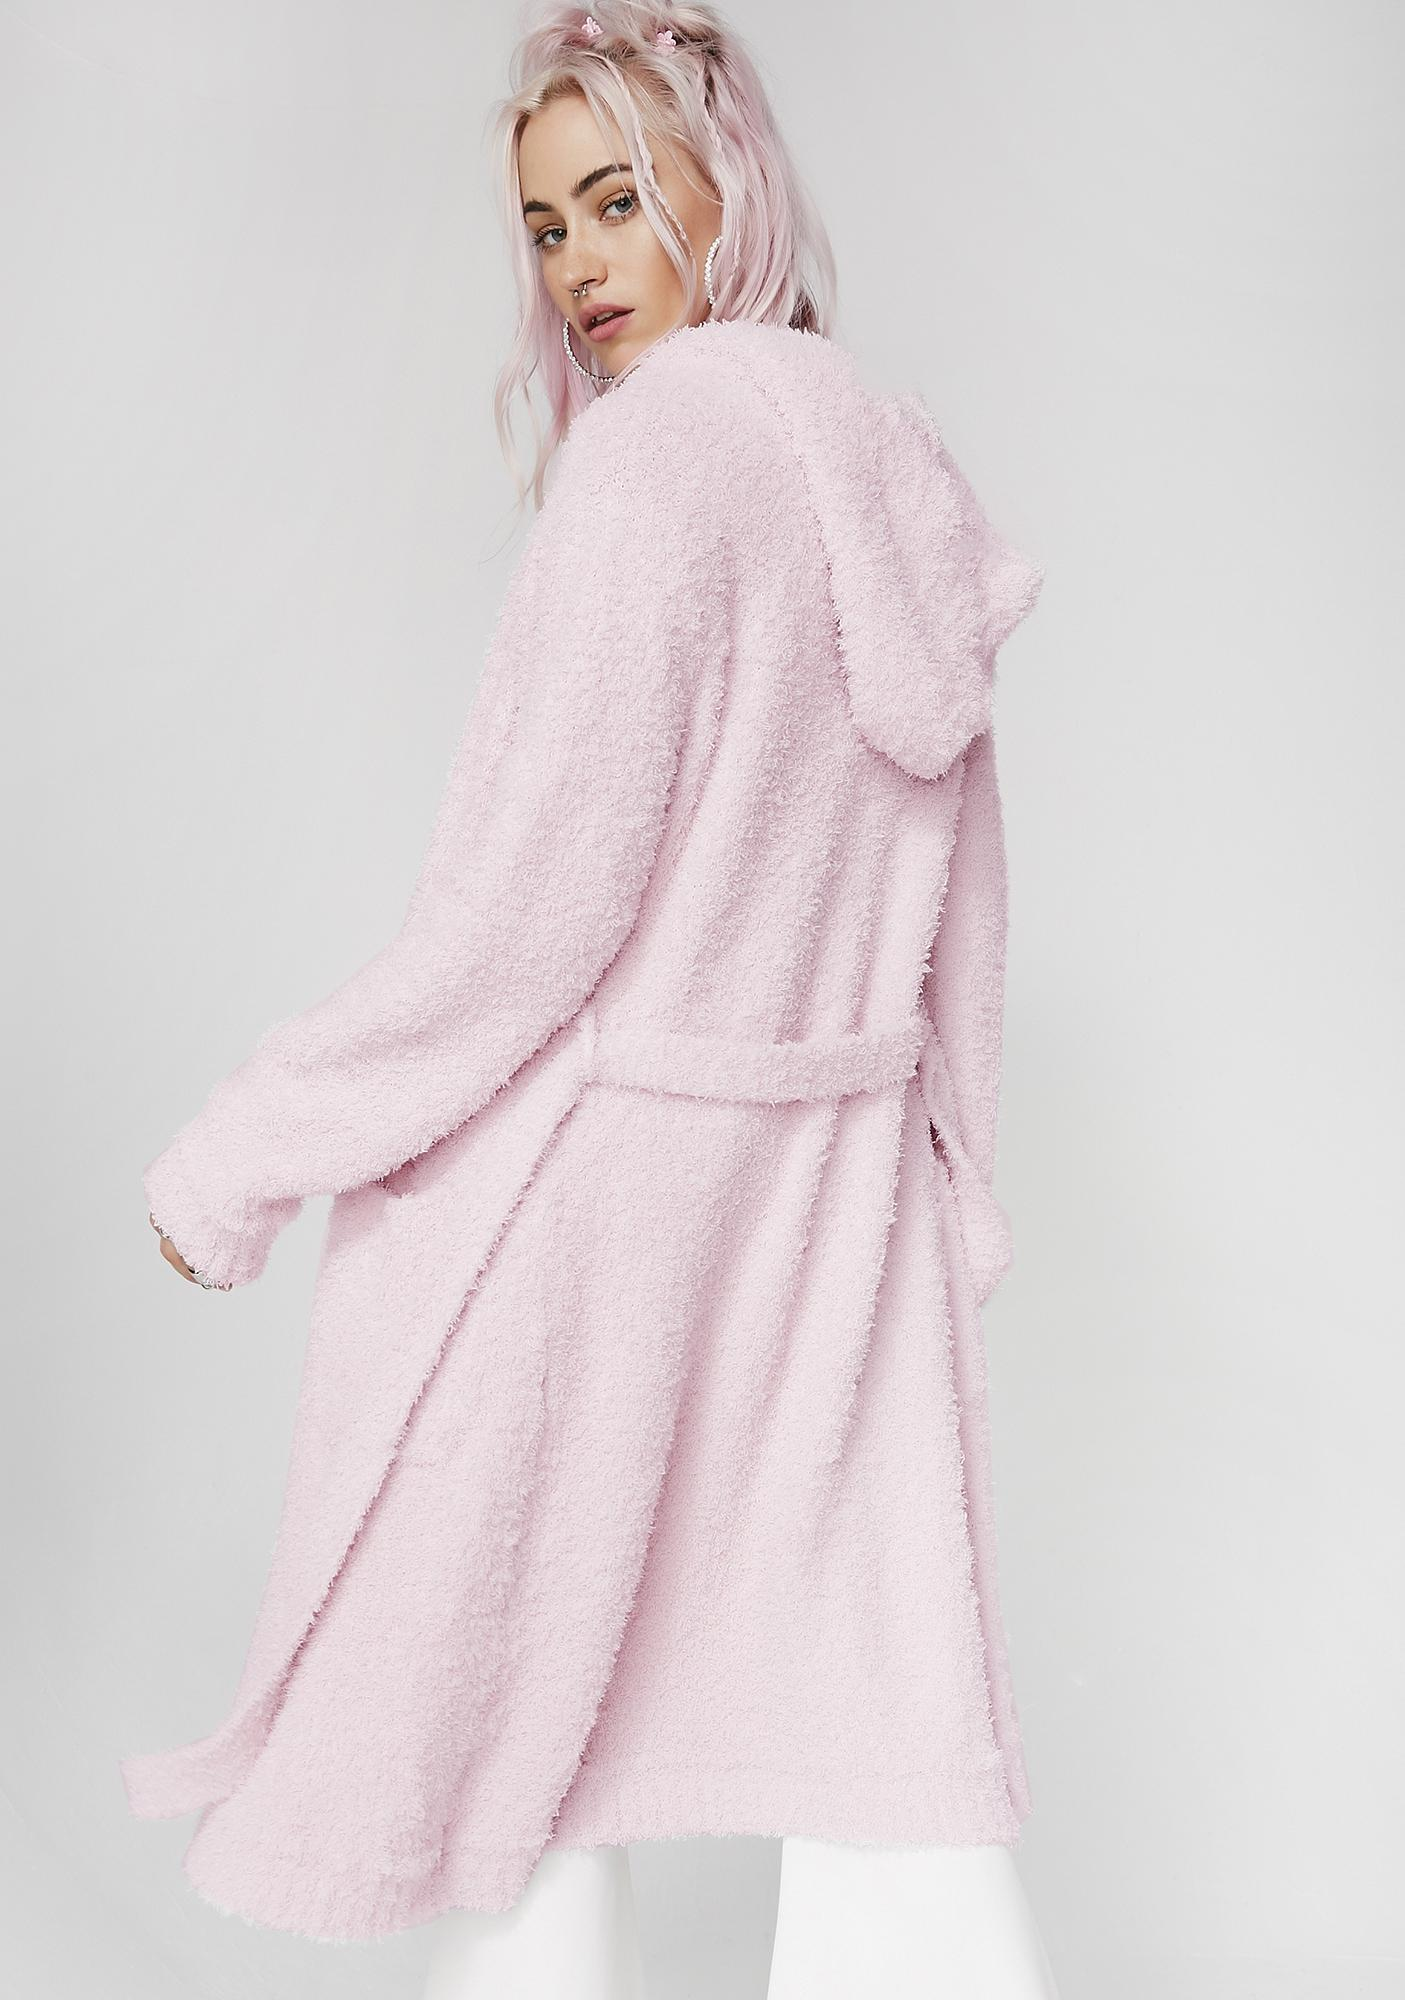 So Comfy Fuzzy Robe